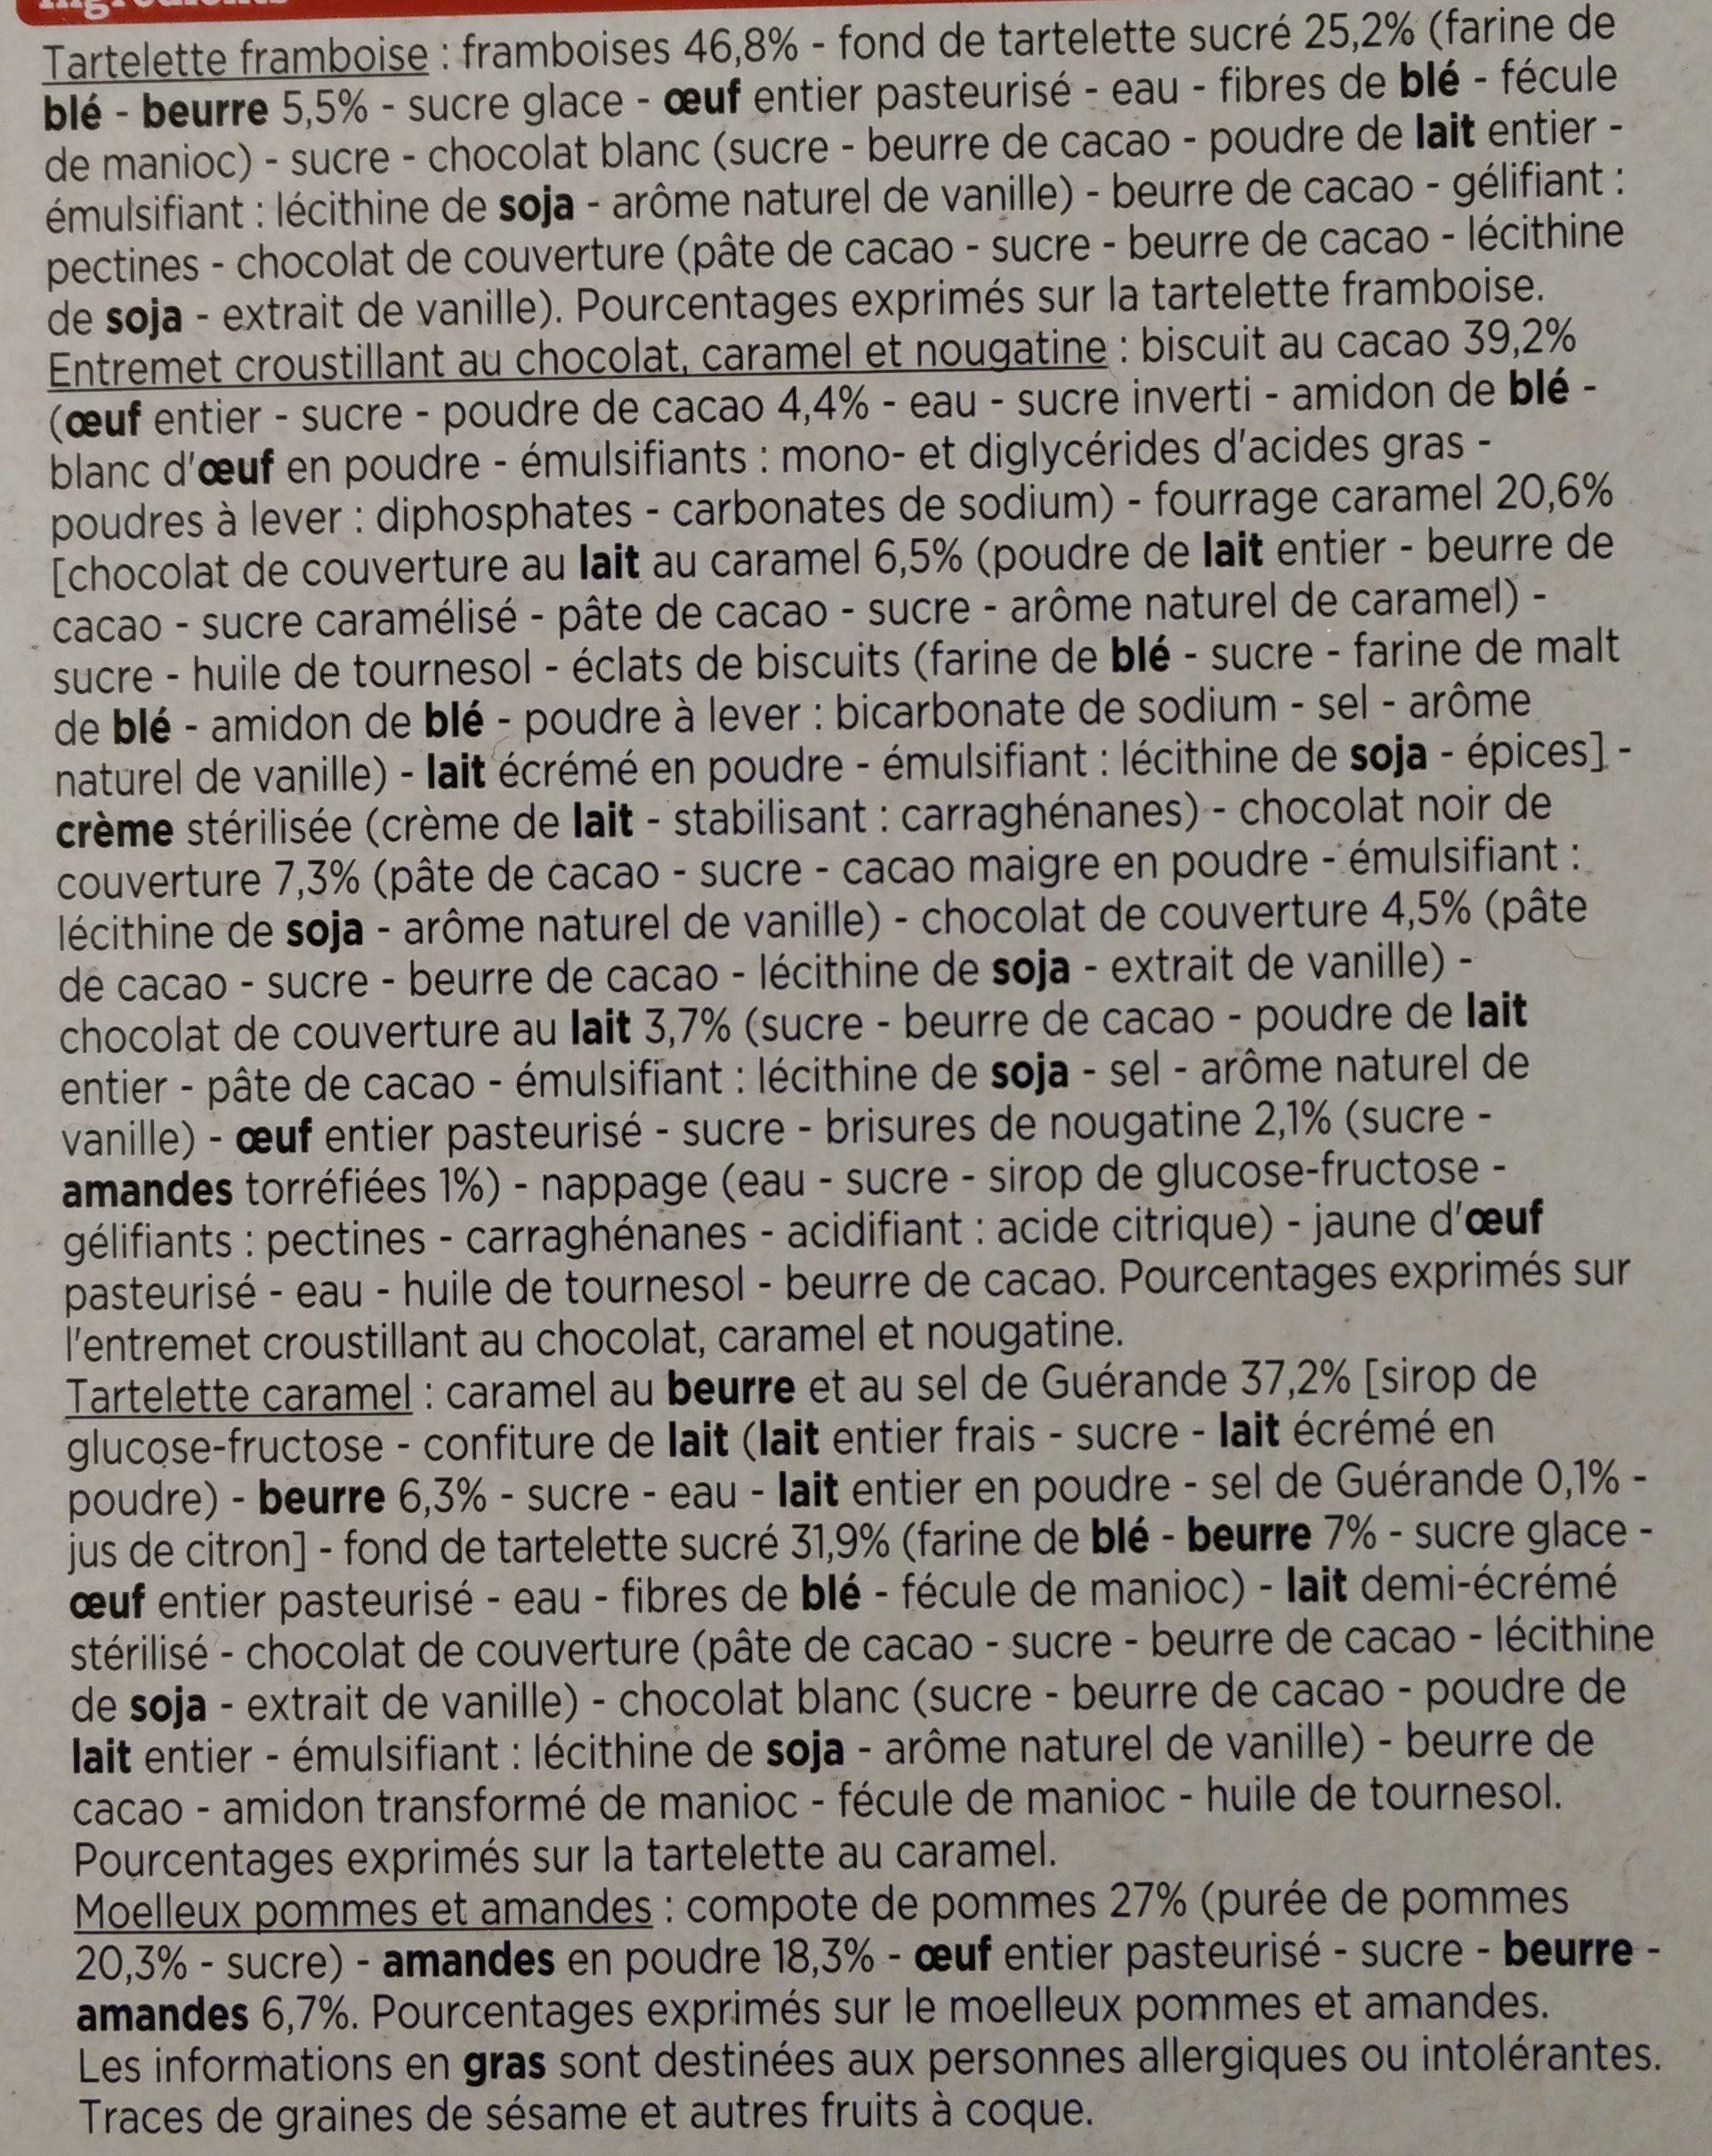 Mignardises - Ingrédients - fr